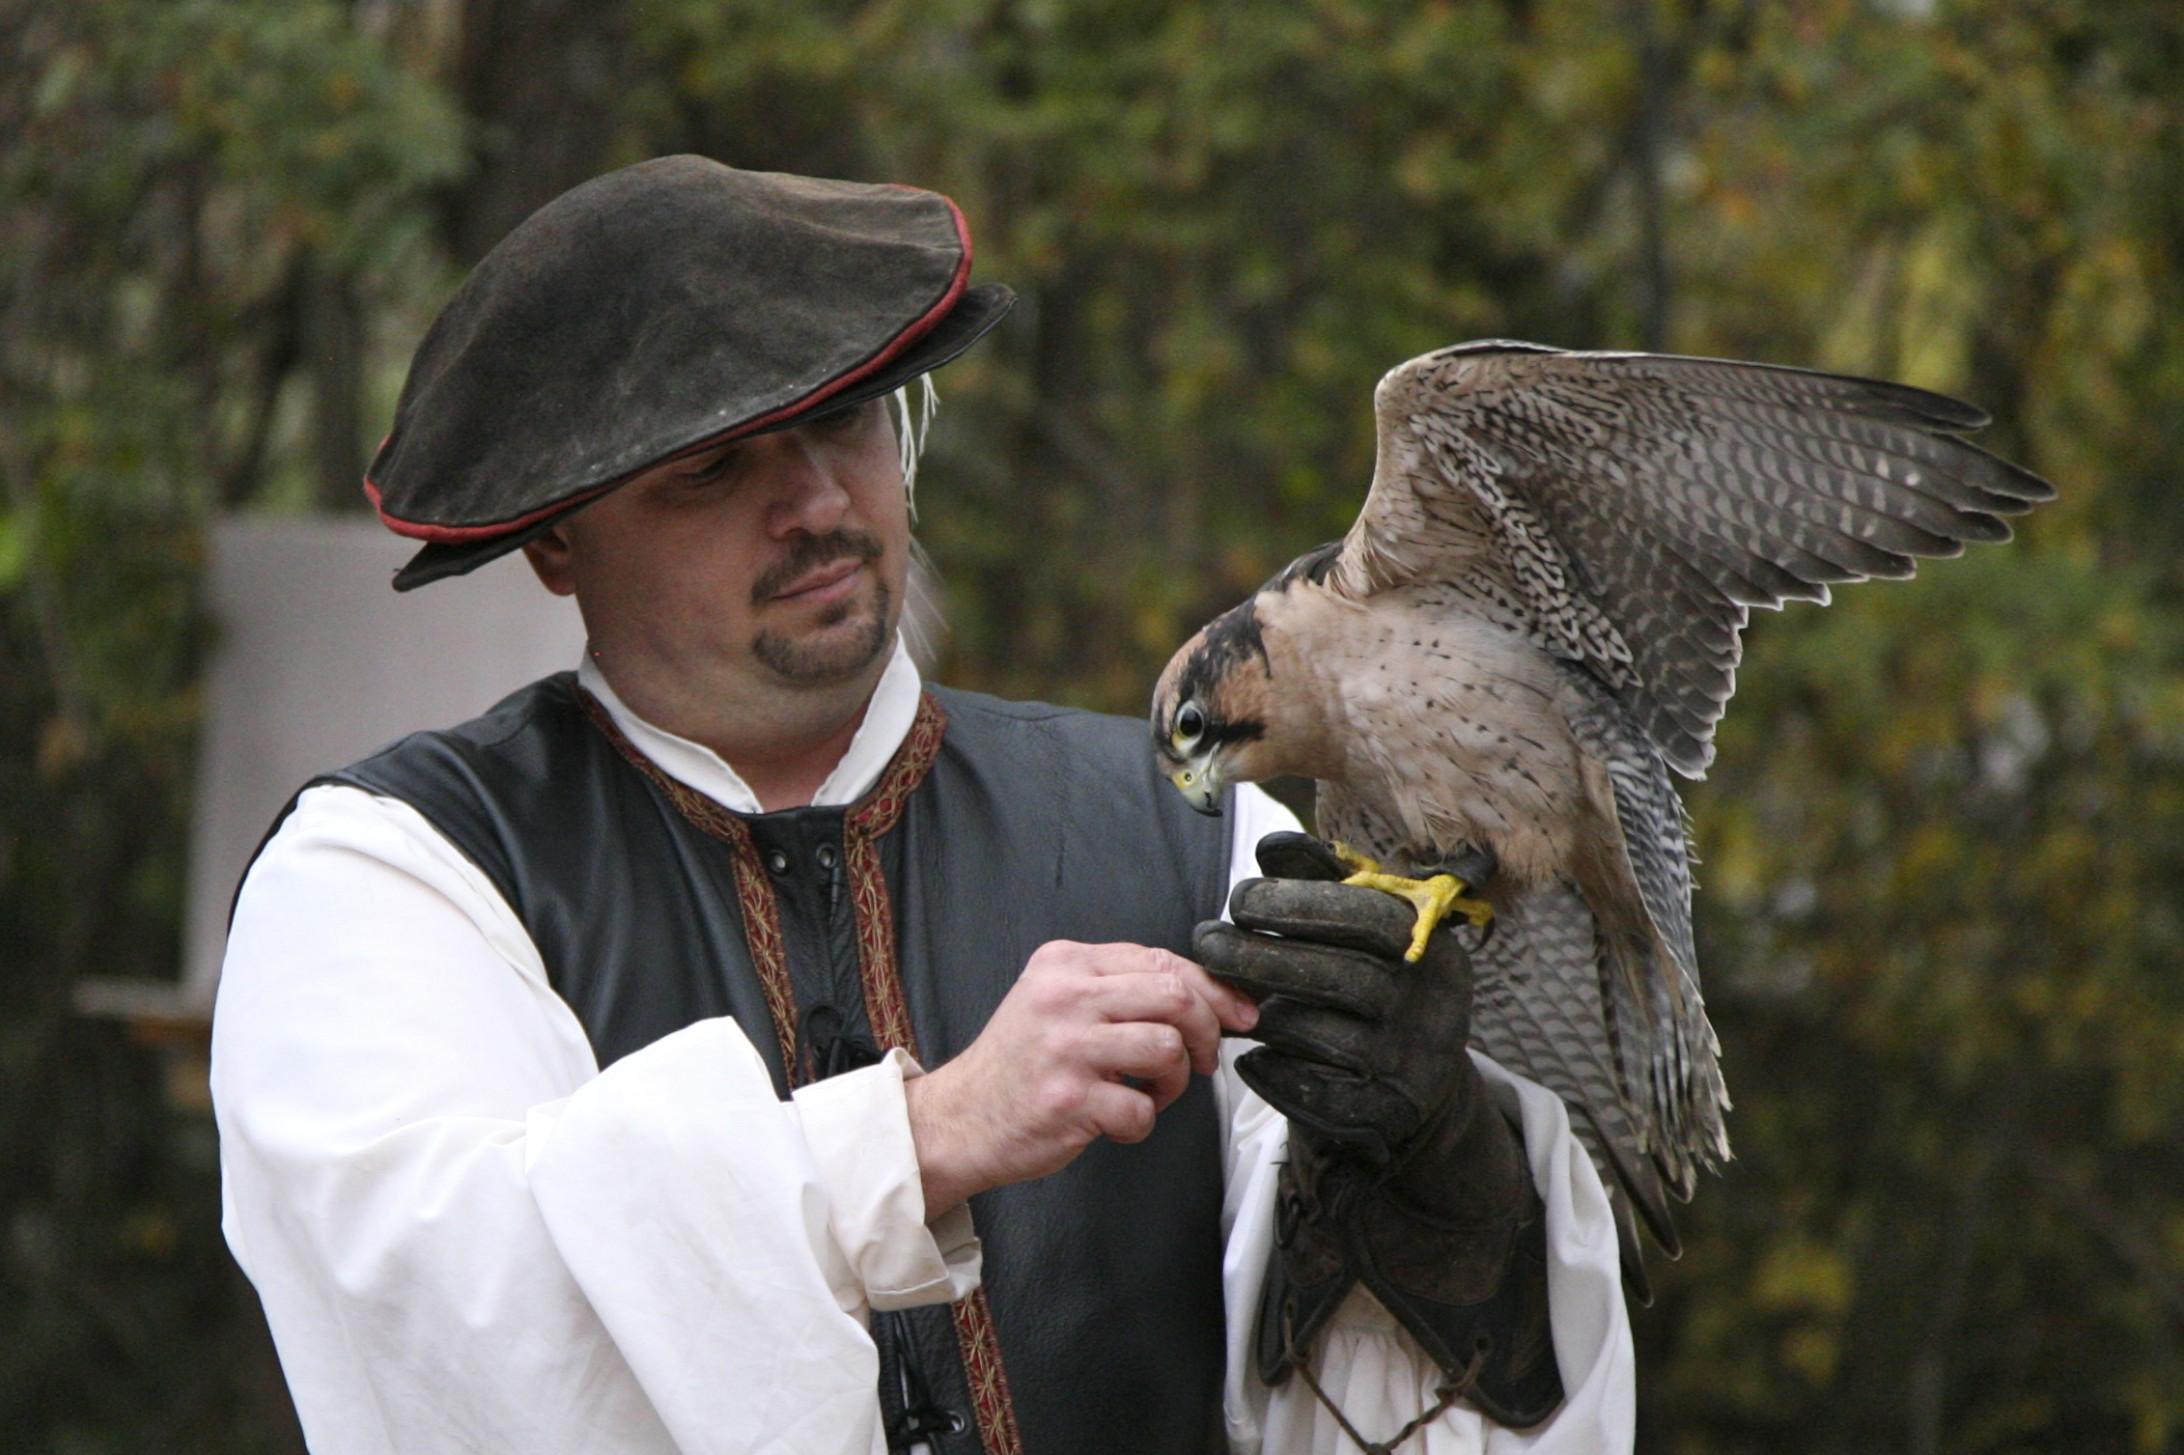 File:TRF falconer.jpg